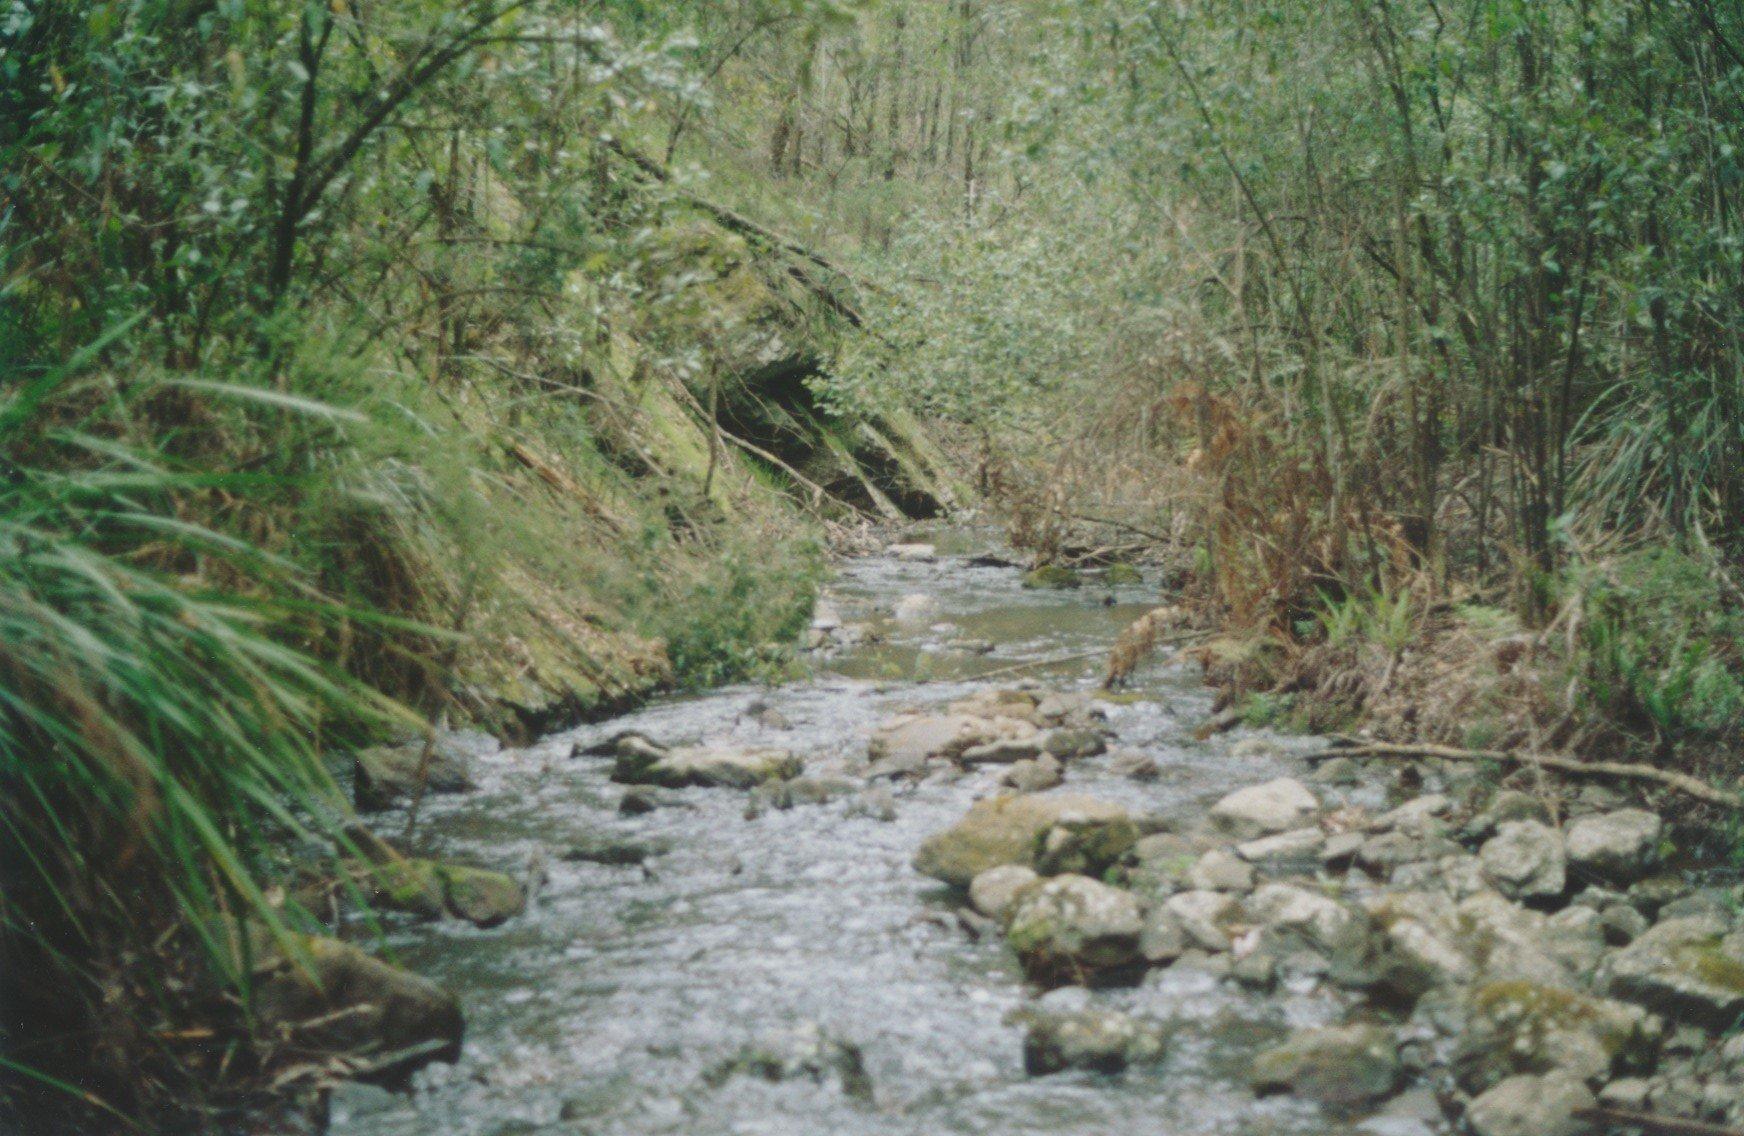 Running Creek, upstream from Sugarloaf reservoir in Kinglake National Park, 2003